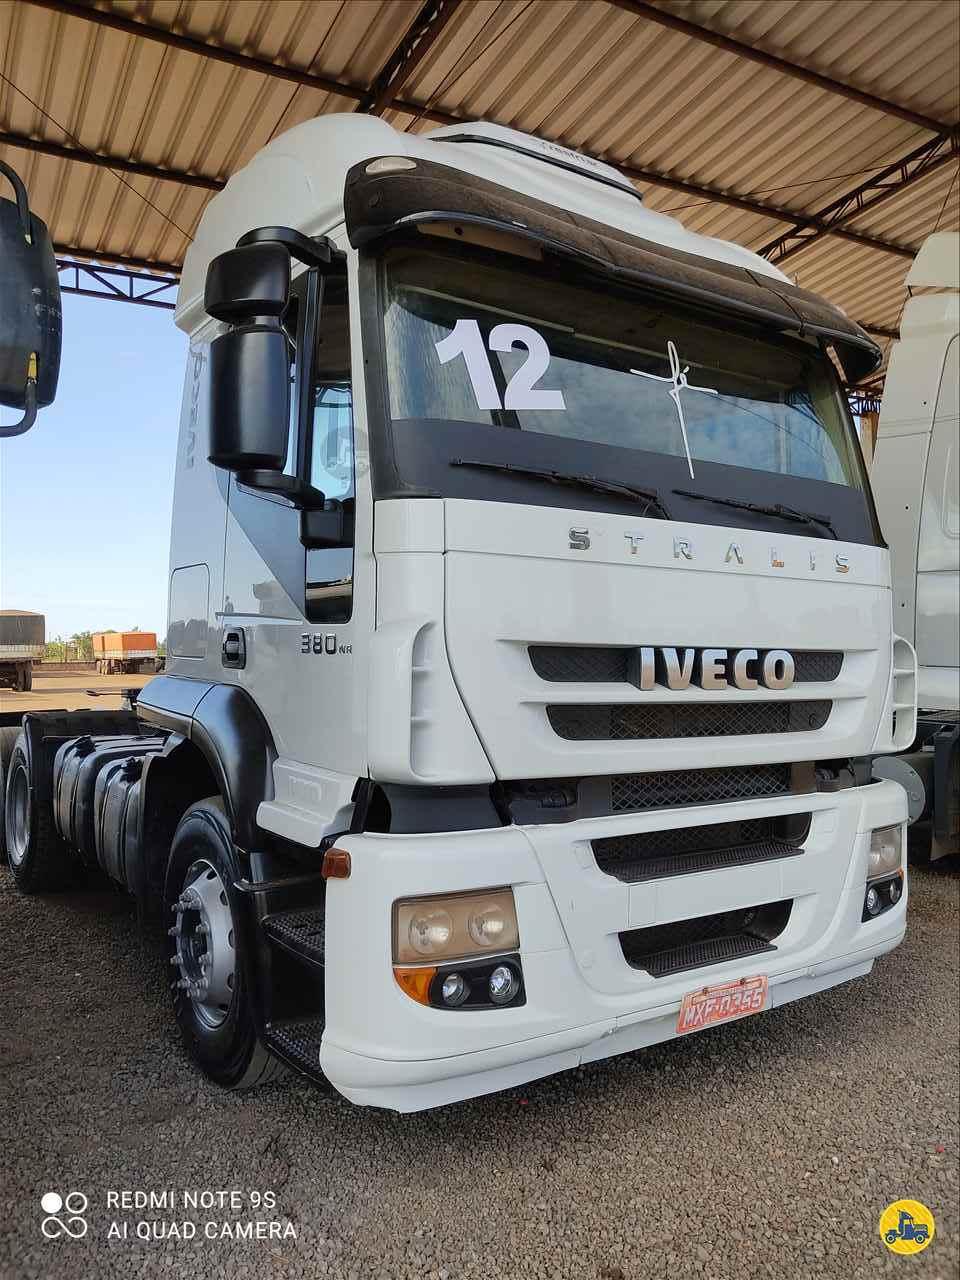 CAMINHAO IVECO STRALIS 380 Cavalo Mecânico Truck 6x2 Rodomati Caminhões PARANAVAI PARANÁ PR